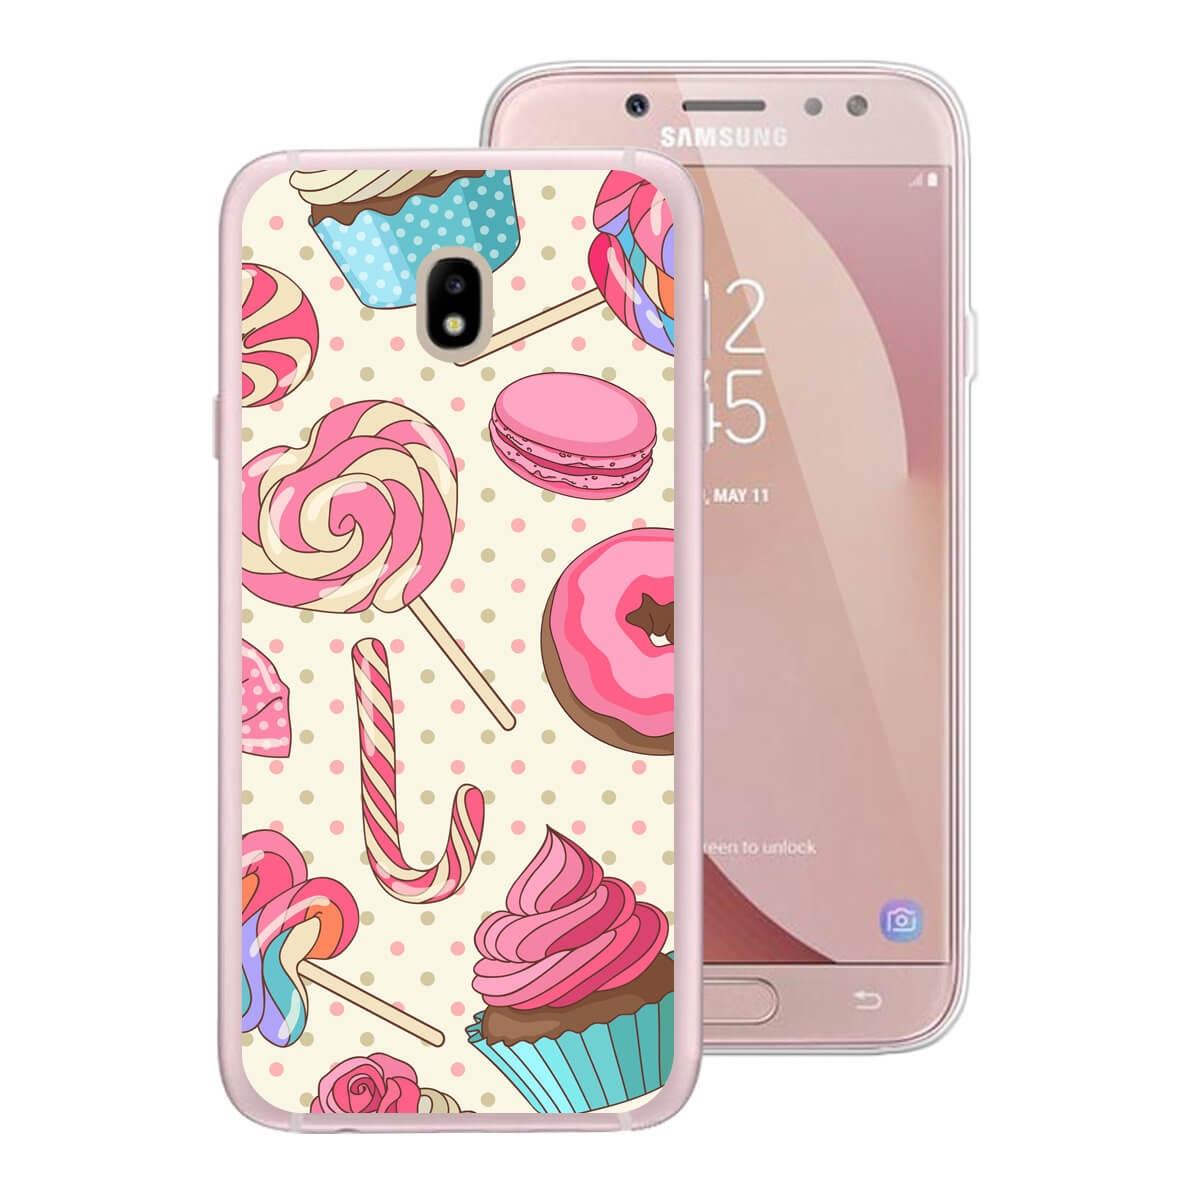 MY ART kryt Samsung Galaxy J5 2017 (J530) CANDY (030)